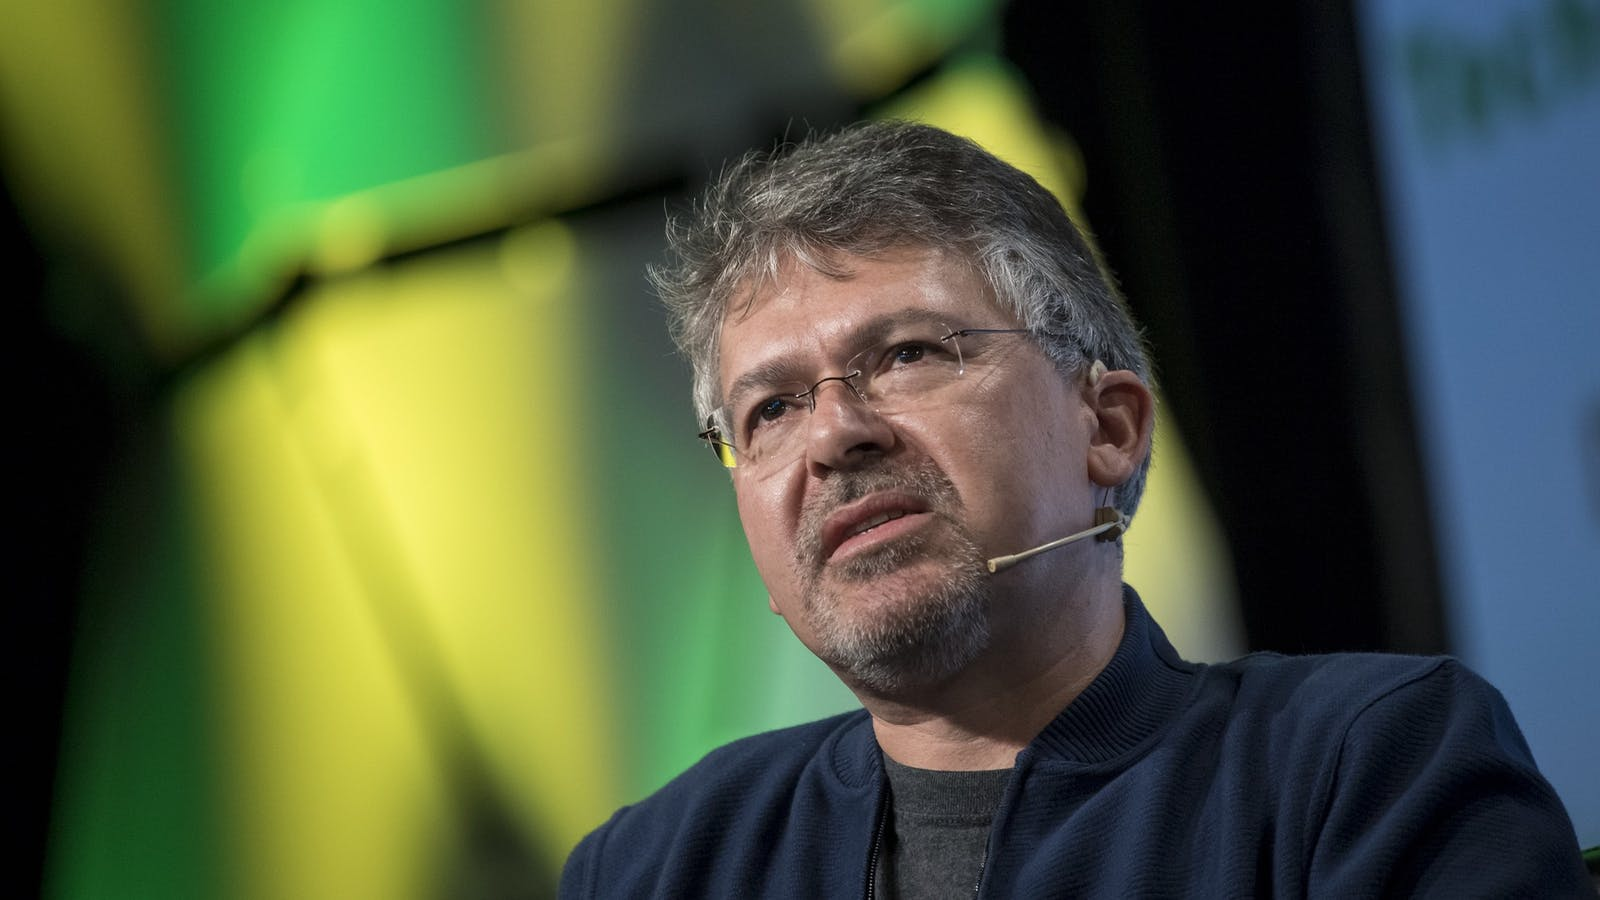 Google's John Giannandrea. Photo: Bloomberg